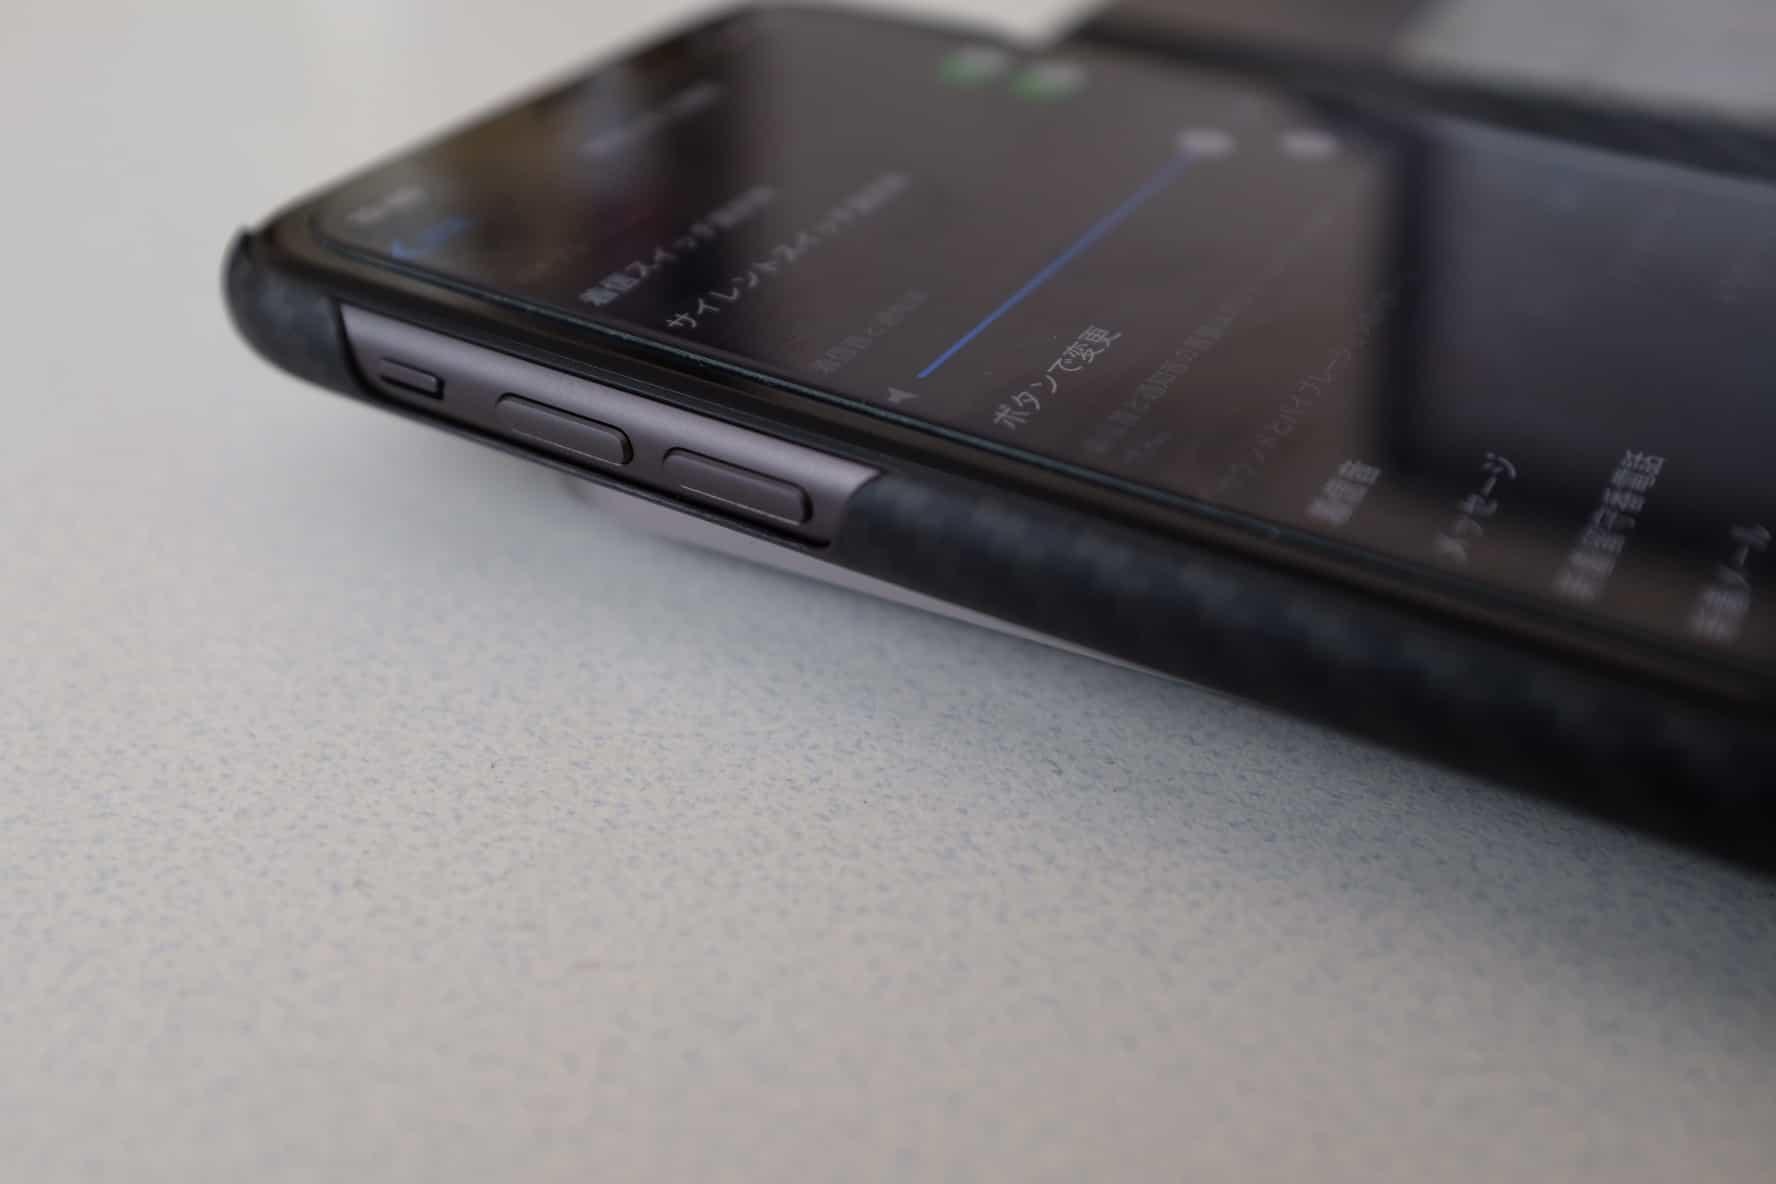 iPhone 11 着信音と通知音、アラームの音量がサイドボタンで調節出来ない!?